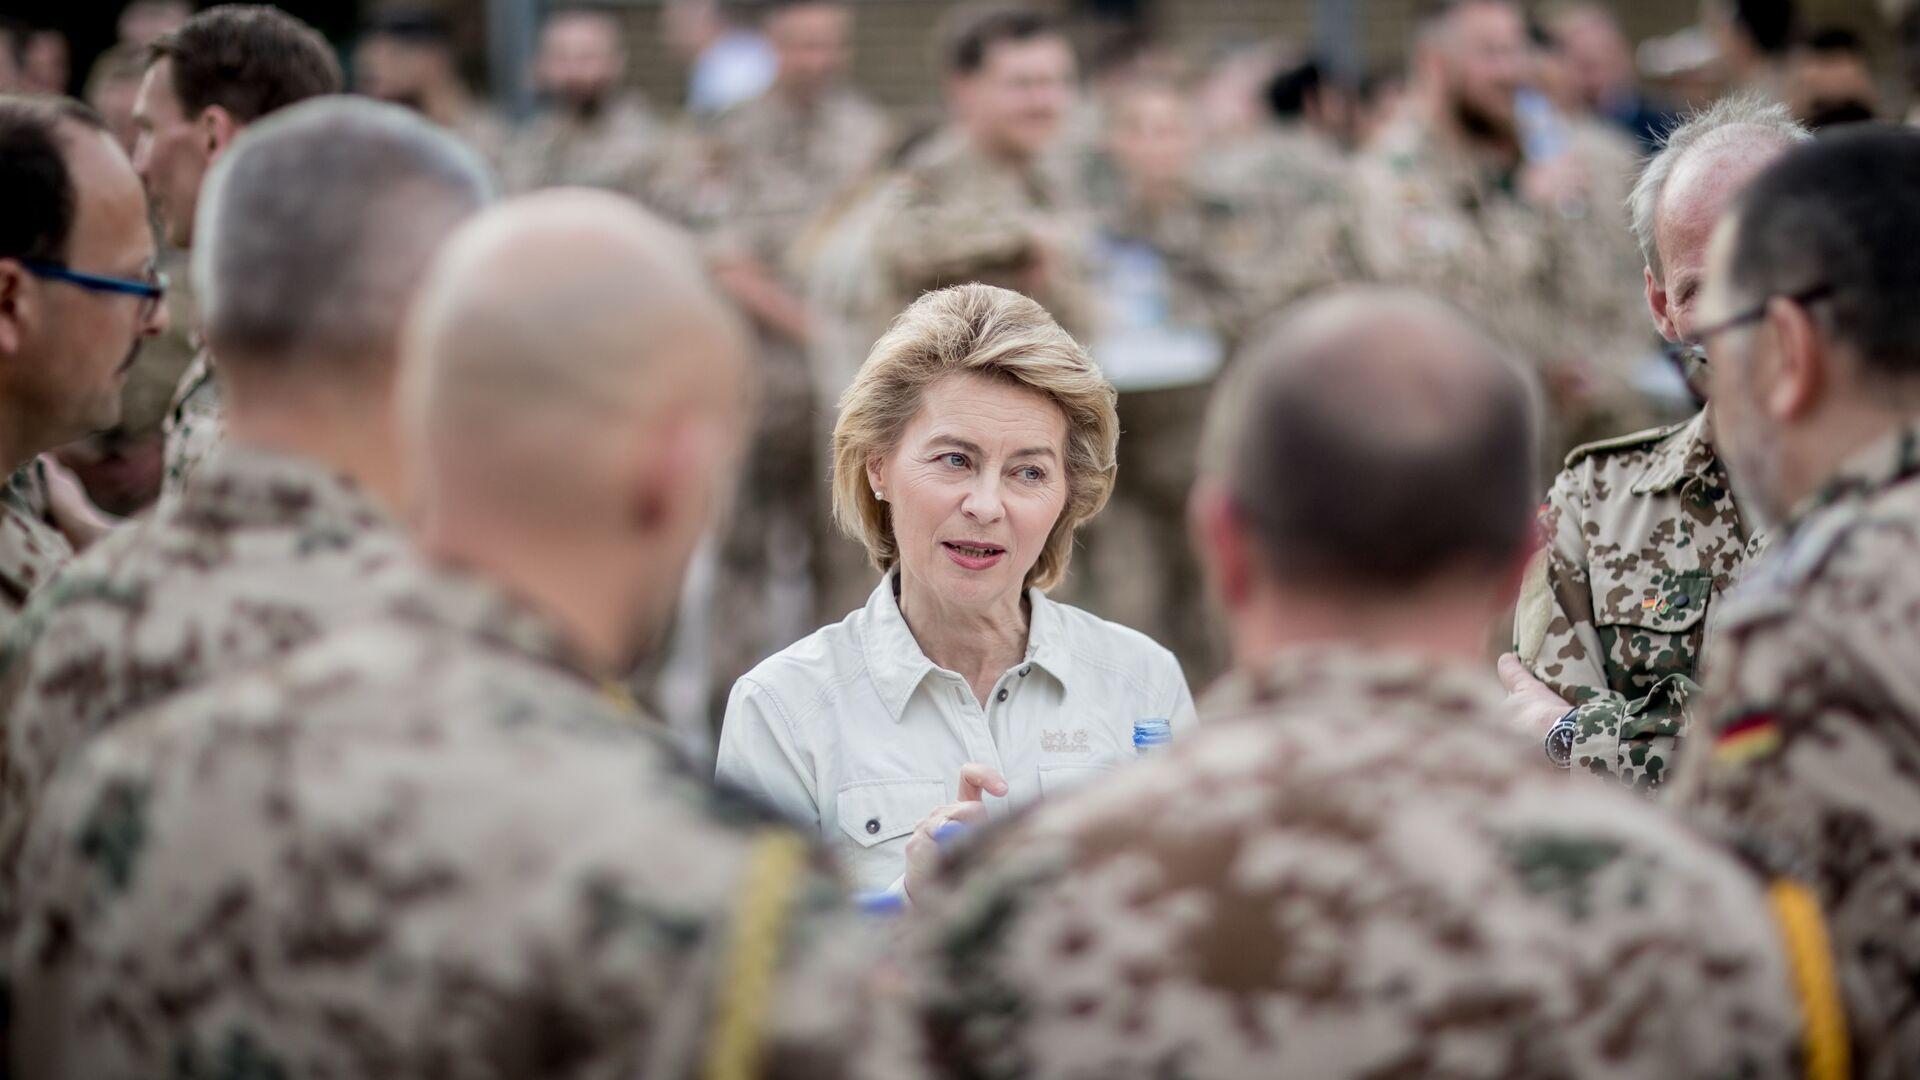 Министр обороны Германии Урсула фон дер Ляйен, 2018 год  - Sputnik Таджикистан, 1920, 18.09.2021